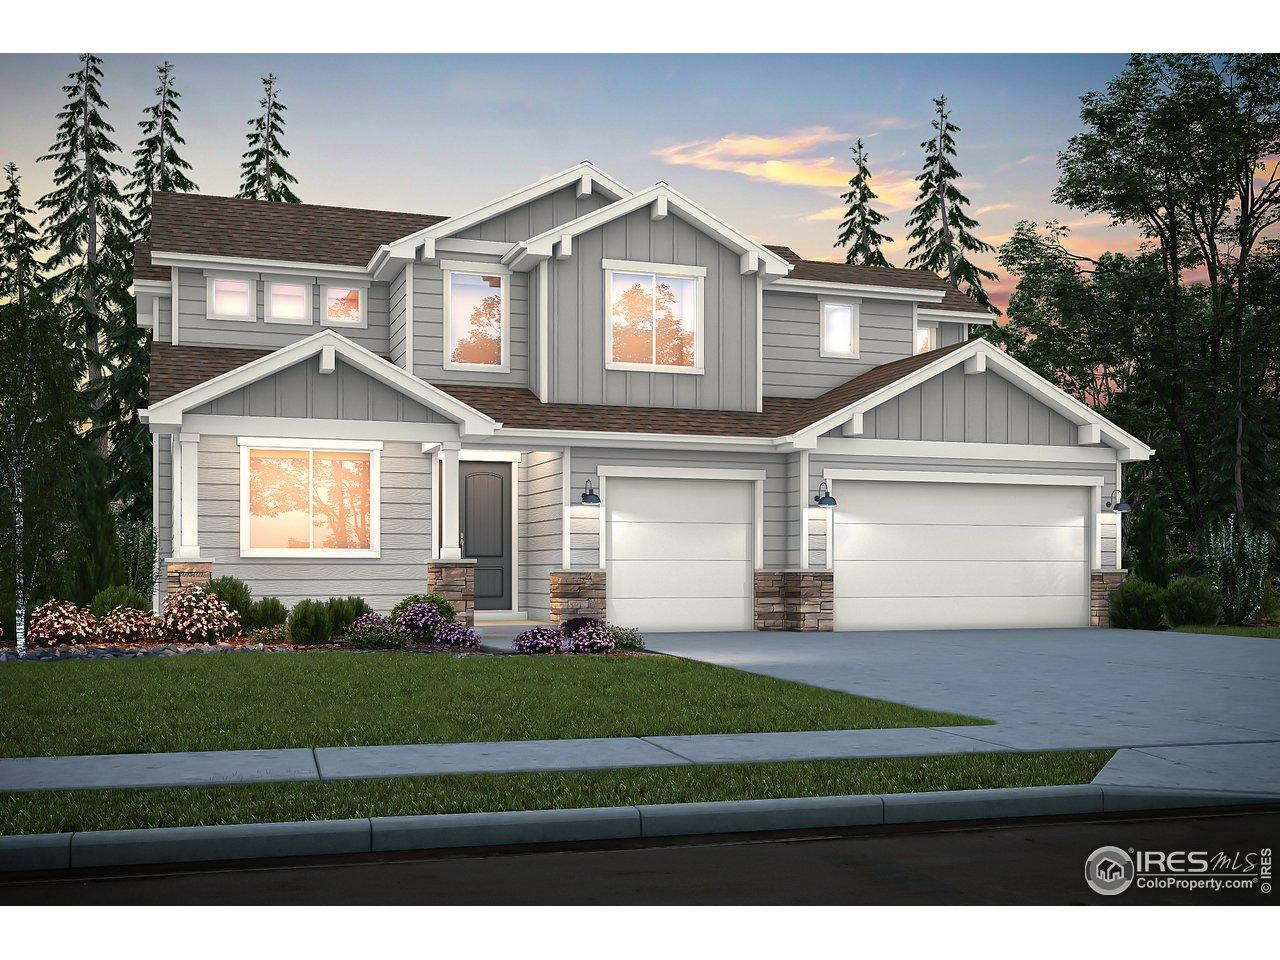 5176 Redmesa Ave, Loveland CO 80538